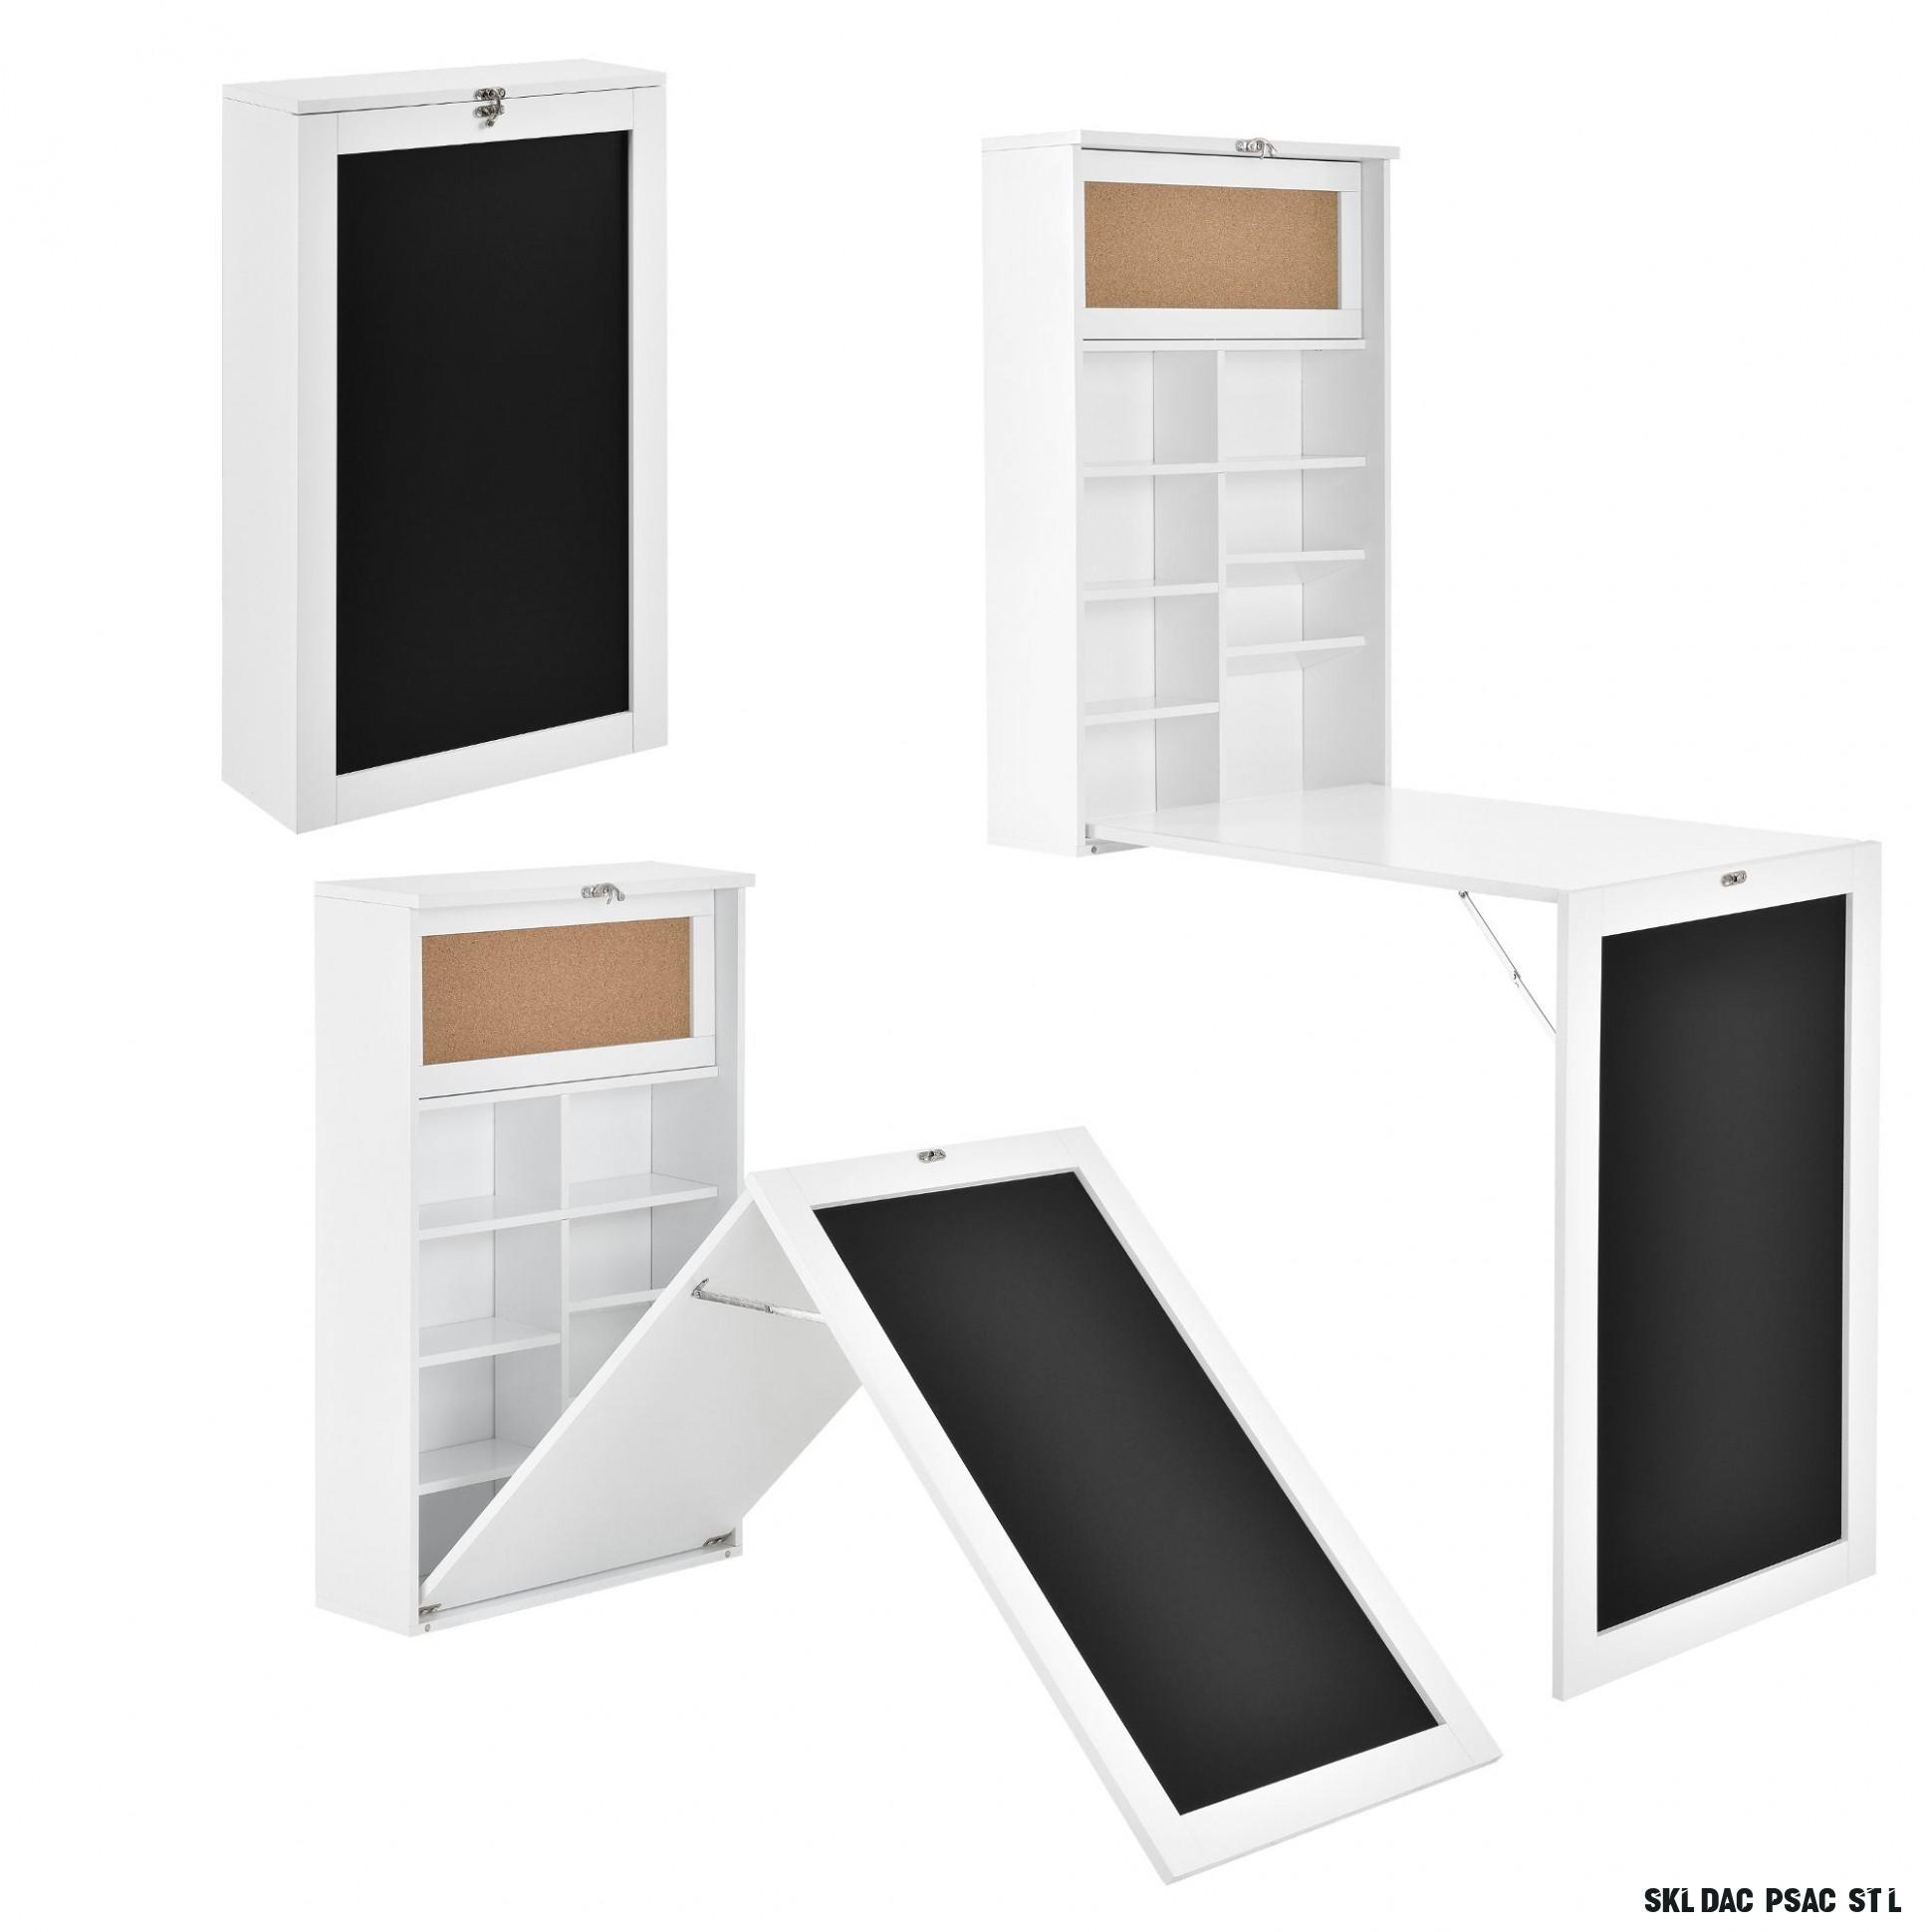 en.casa] ABWS-18 psací stůl skládací 18 x 18 cm  InHaus.cz